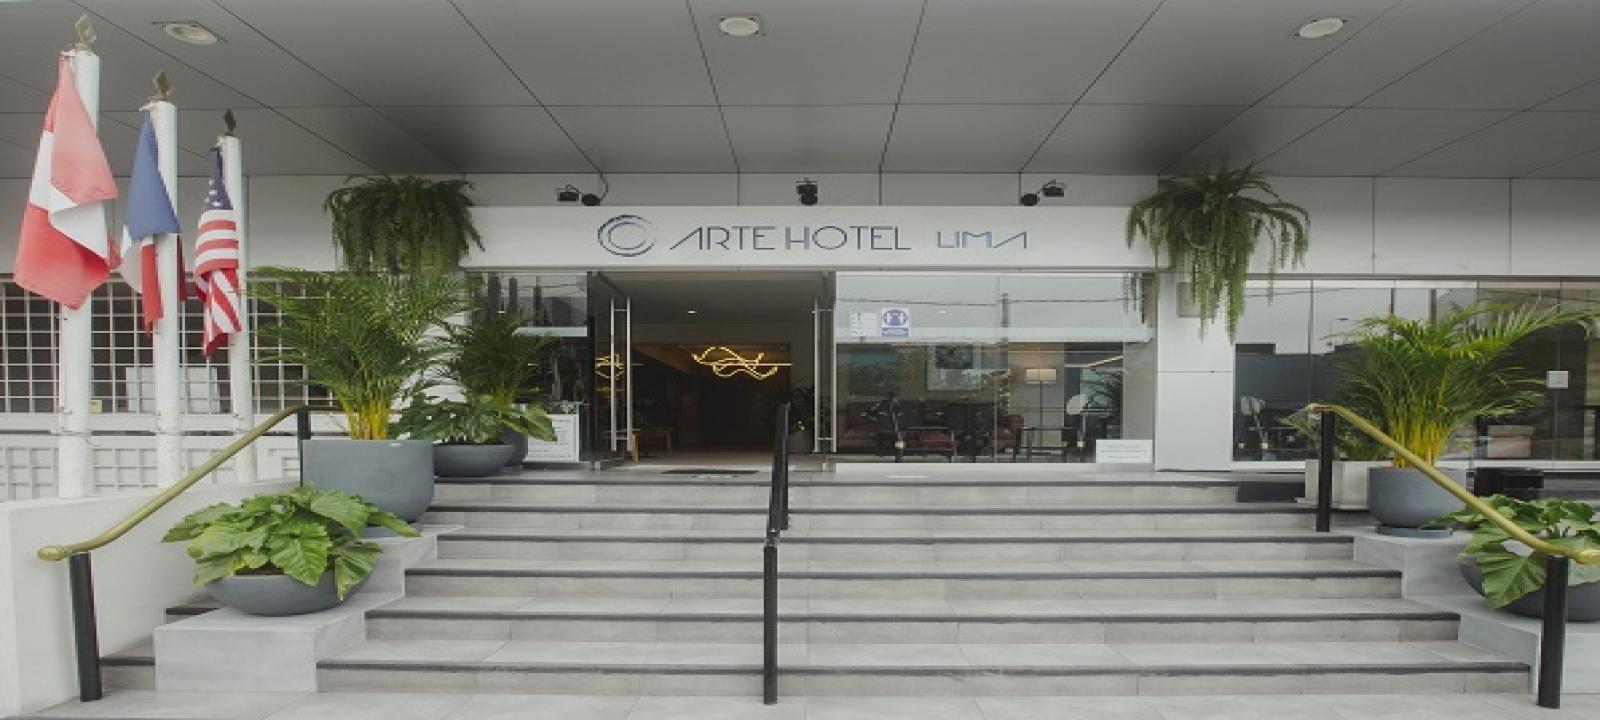 Lima, Peru, ,International Properties,For Sale,1073